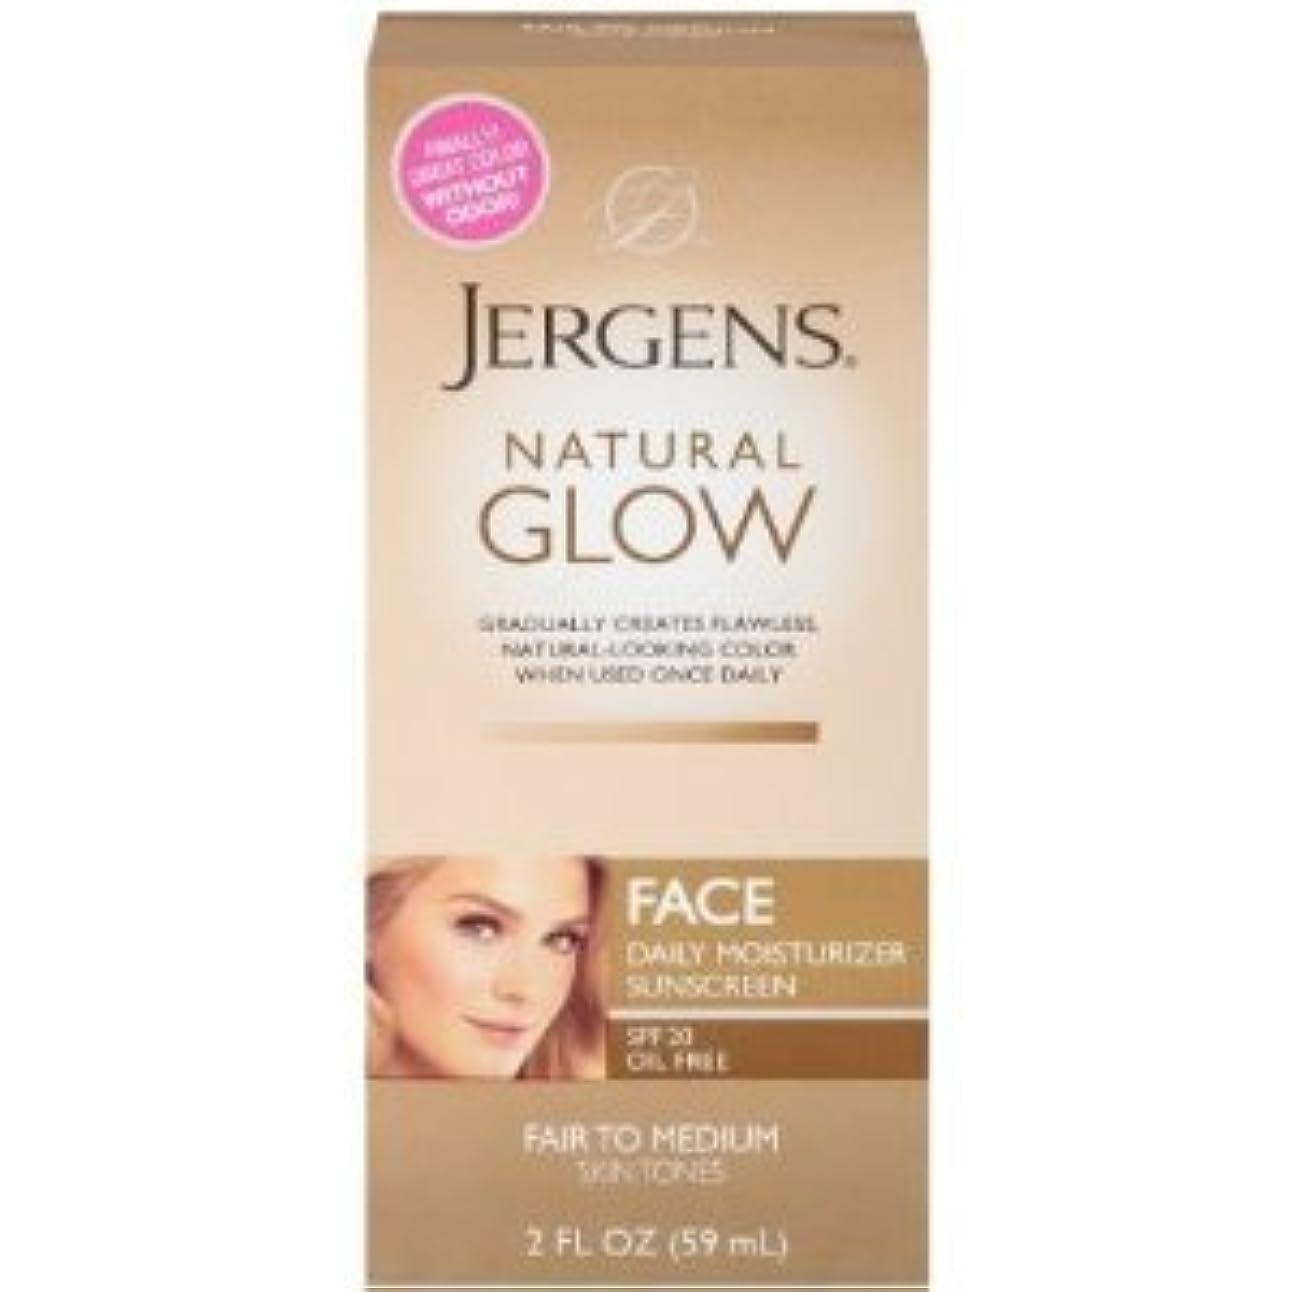 提案幼児脚本家Natural Glow Healthy Complexion Daily Facial Moisturizer, SPF 20, Fair to Medium Tan, (59ml) (海外直送品)